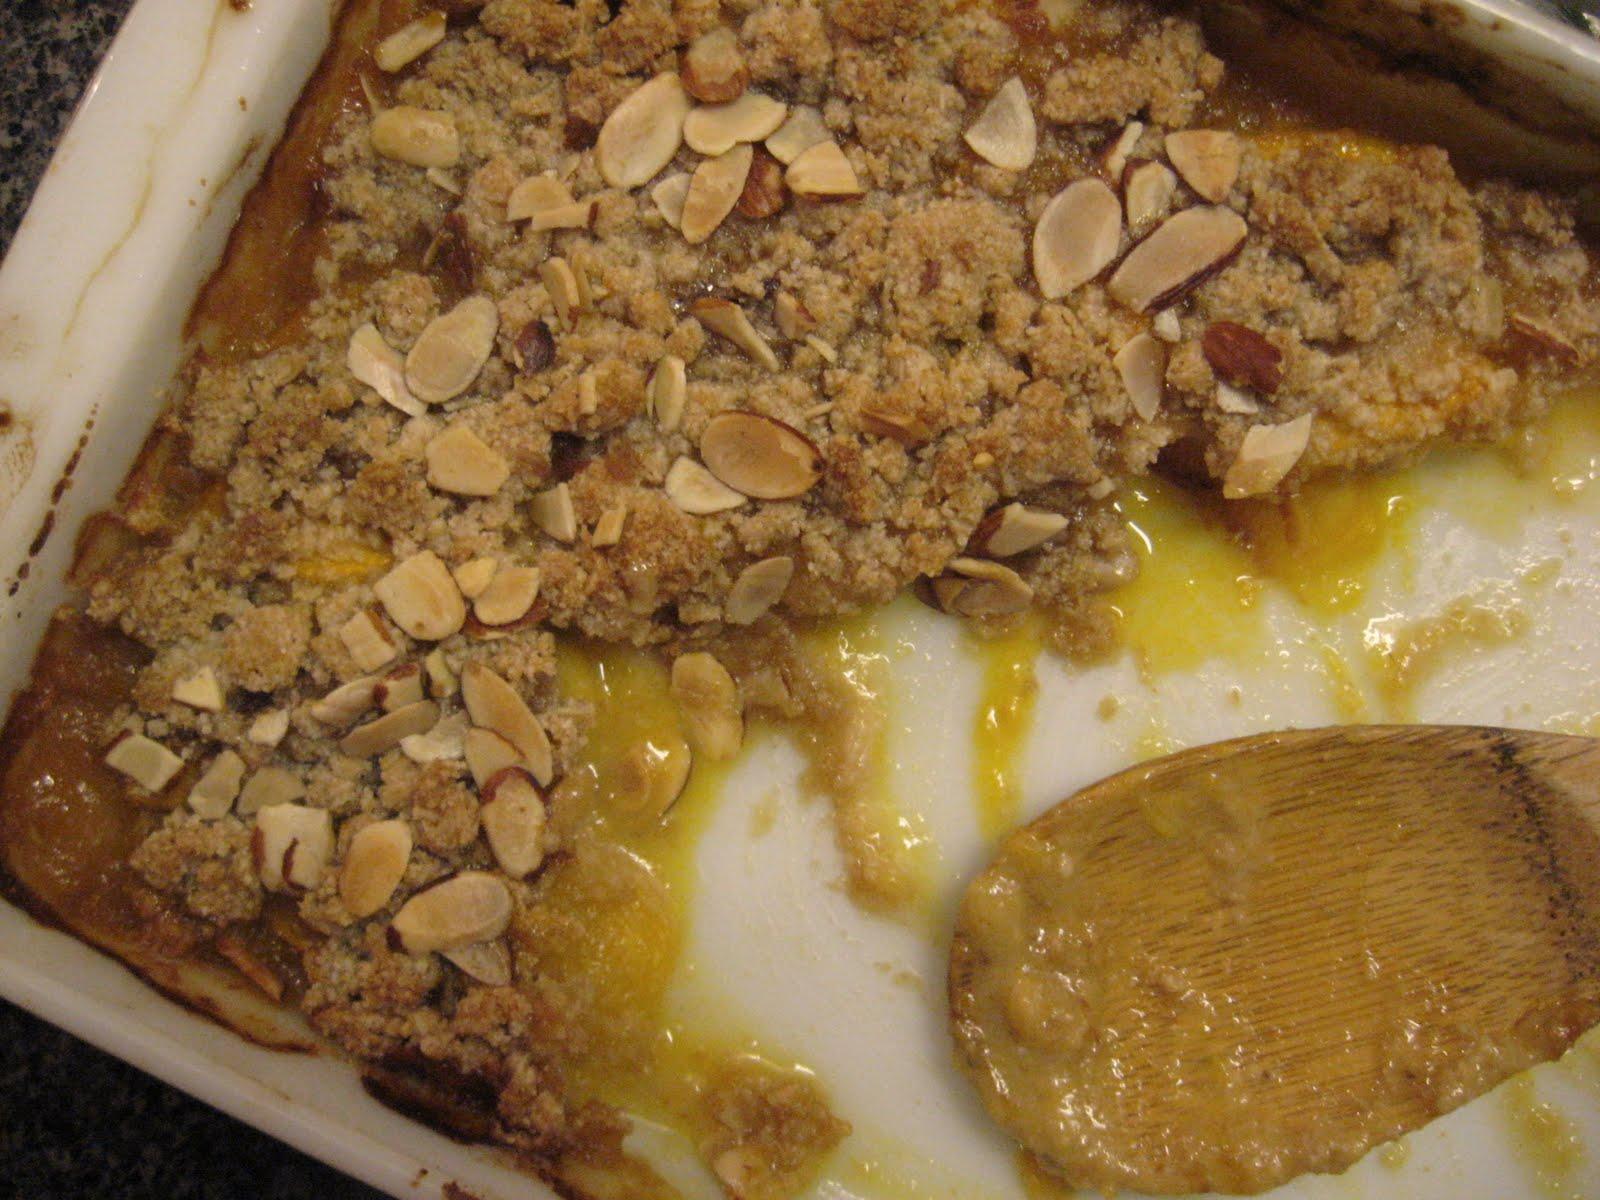 gluten free peach almond crisp recipe free of gluten dairy